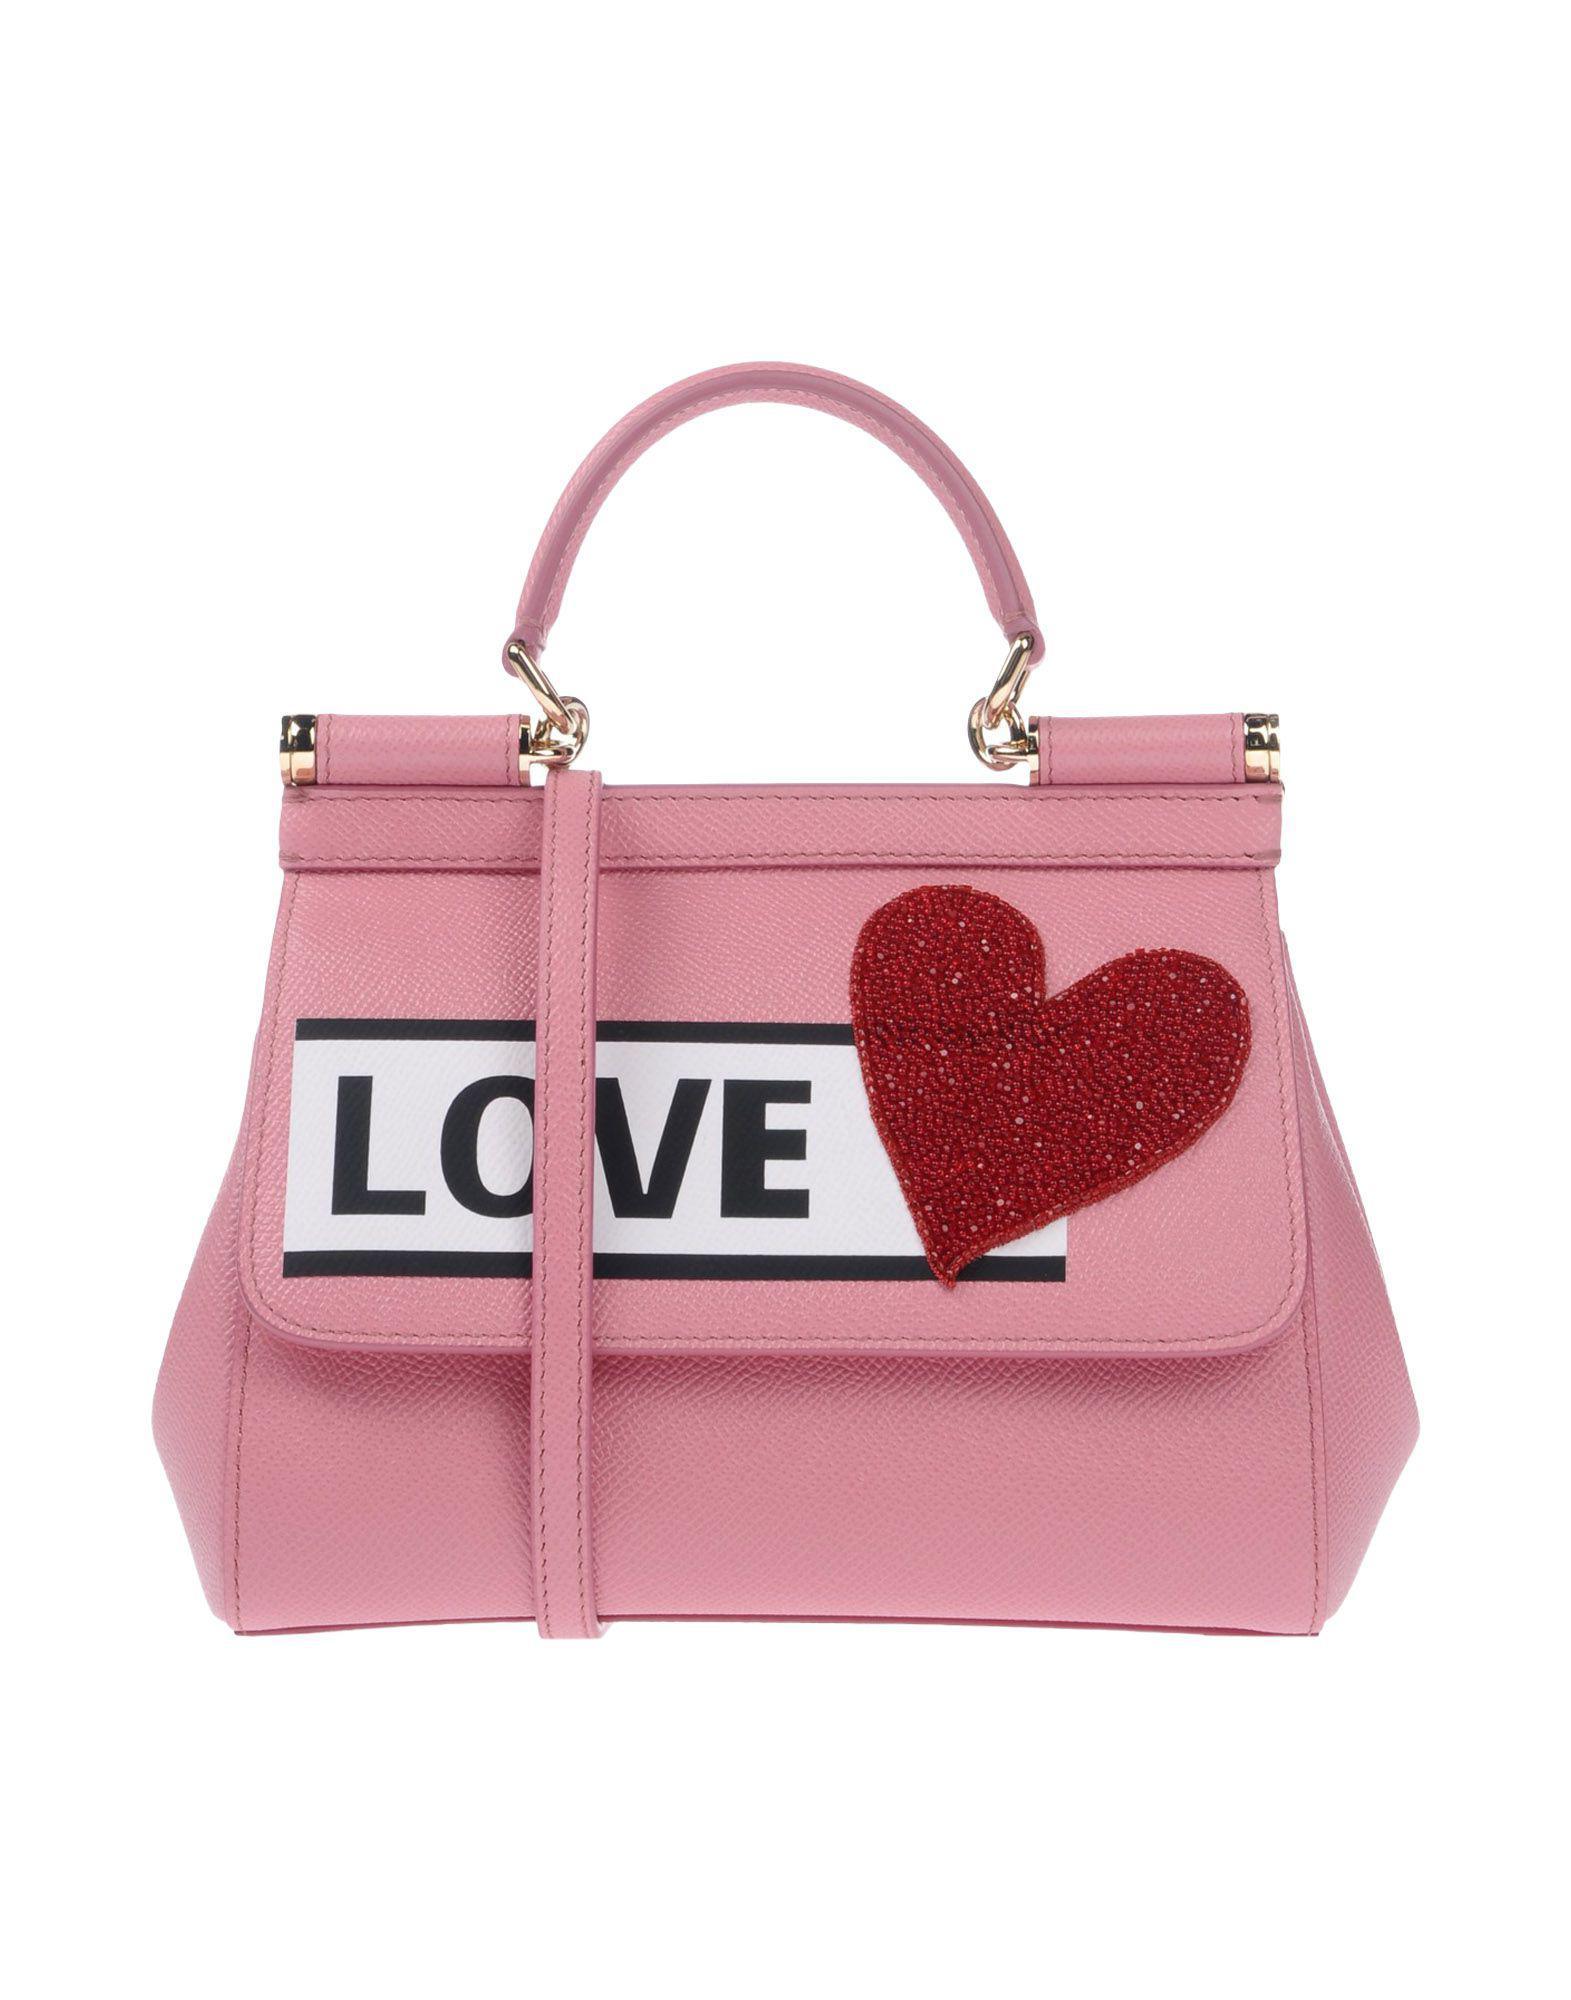 e5f829e9a6a9 Lyst - Dolce   Gabbana Handbag in Pink